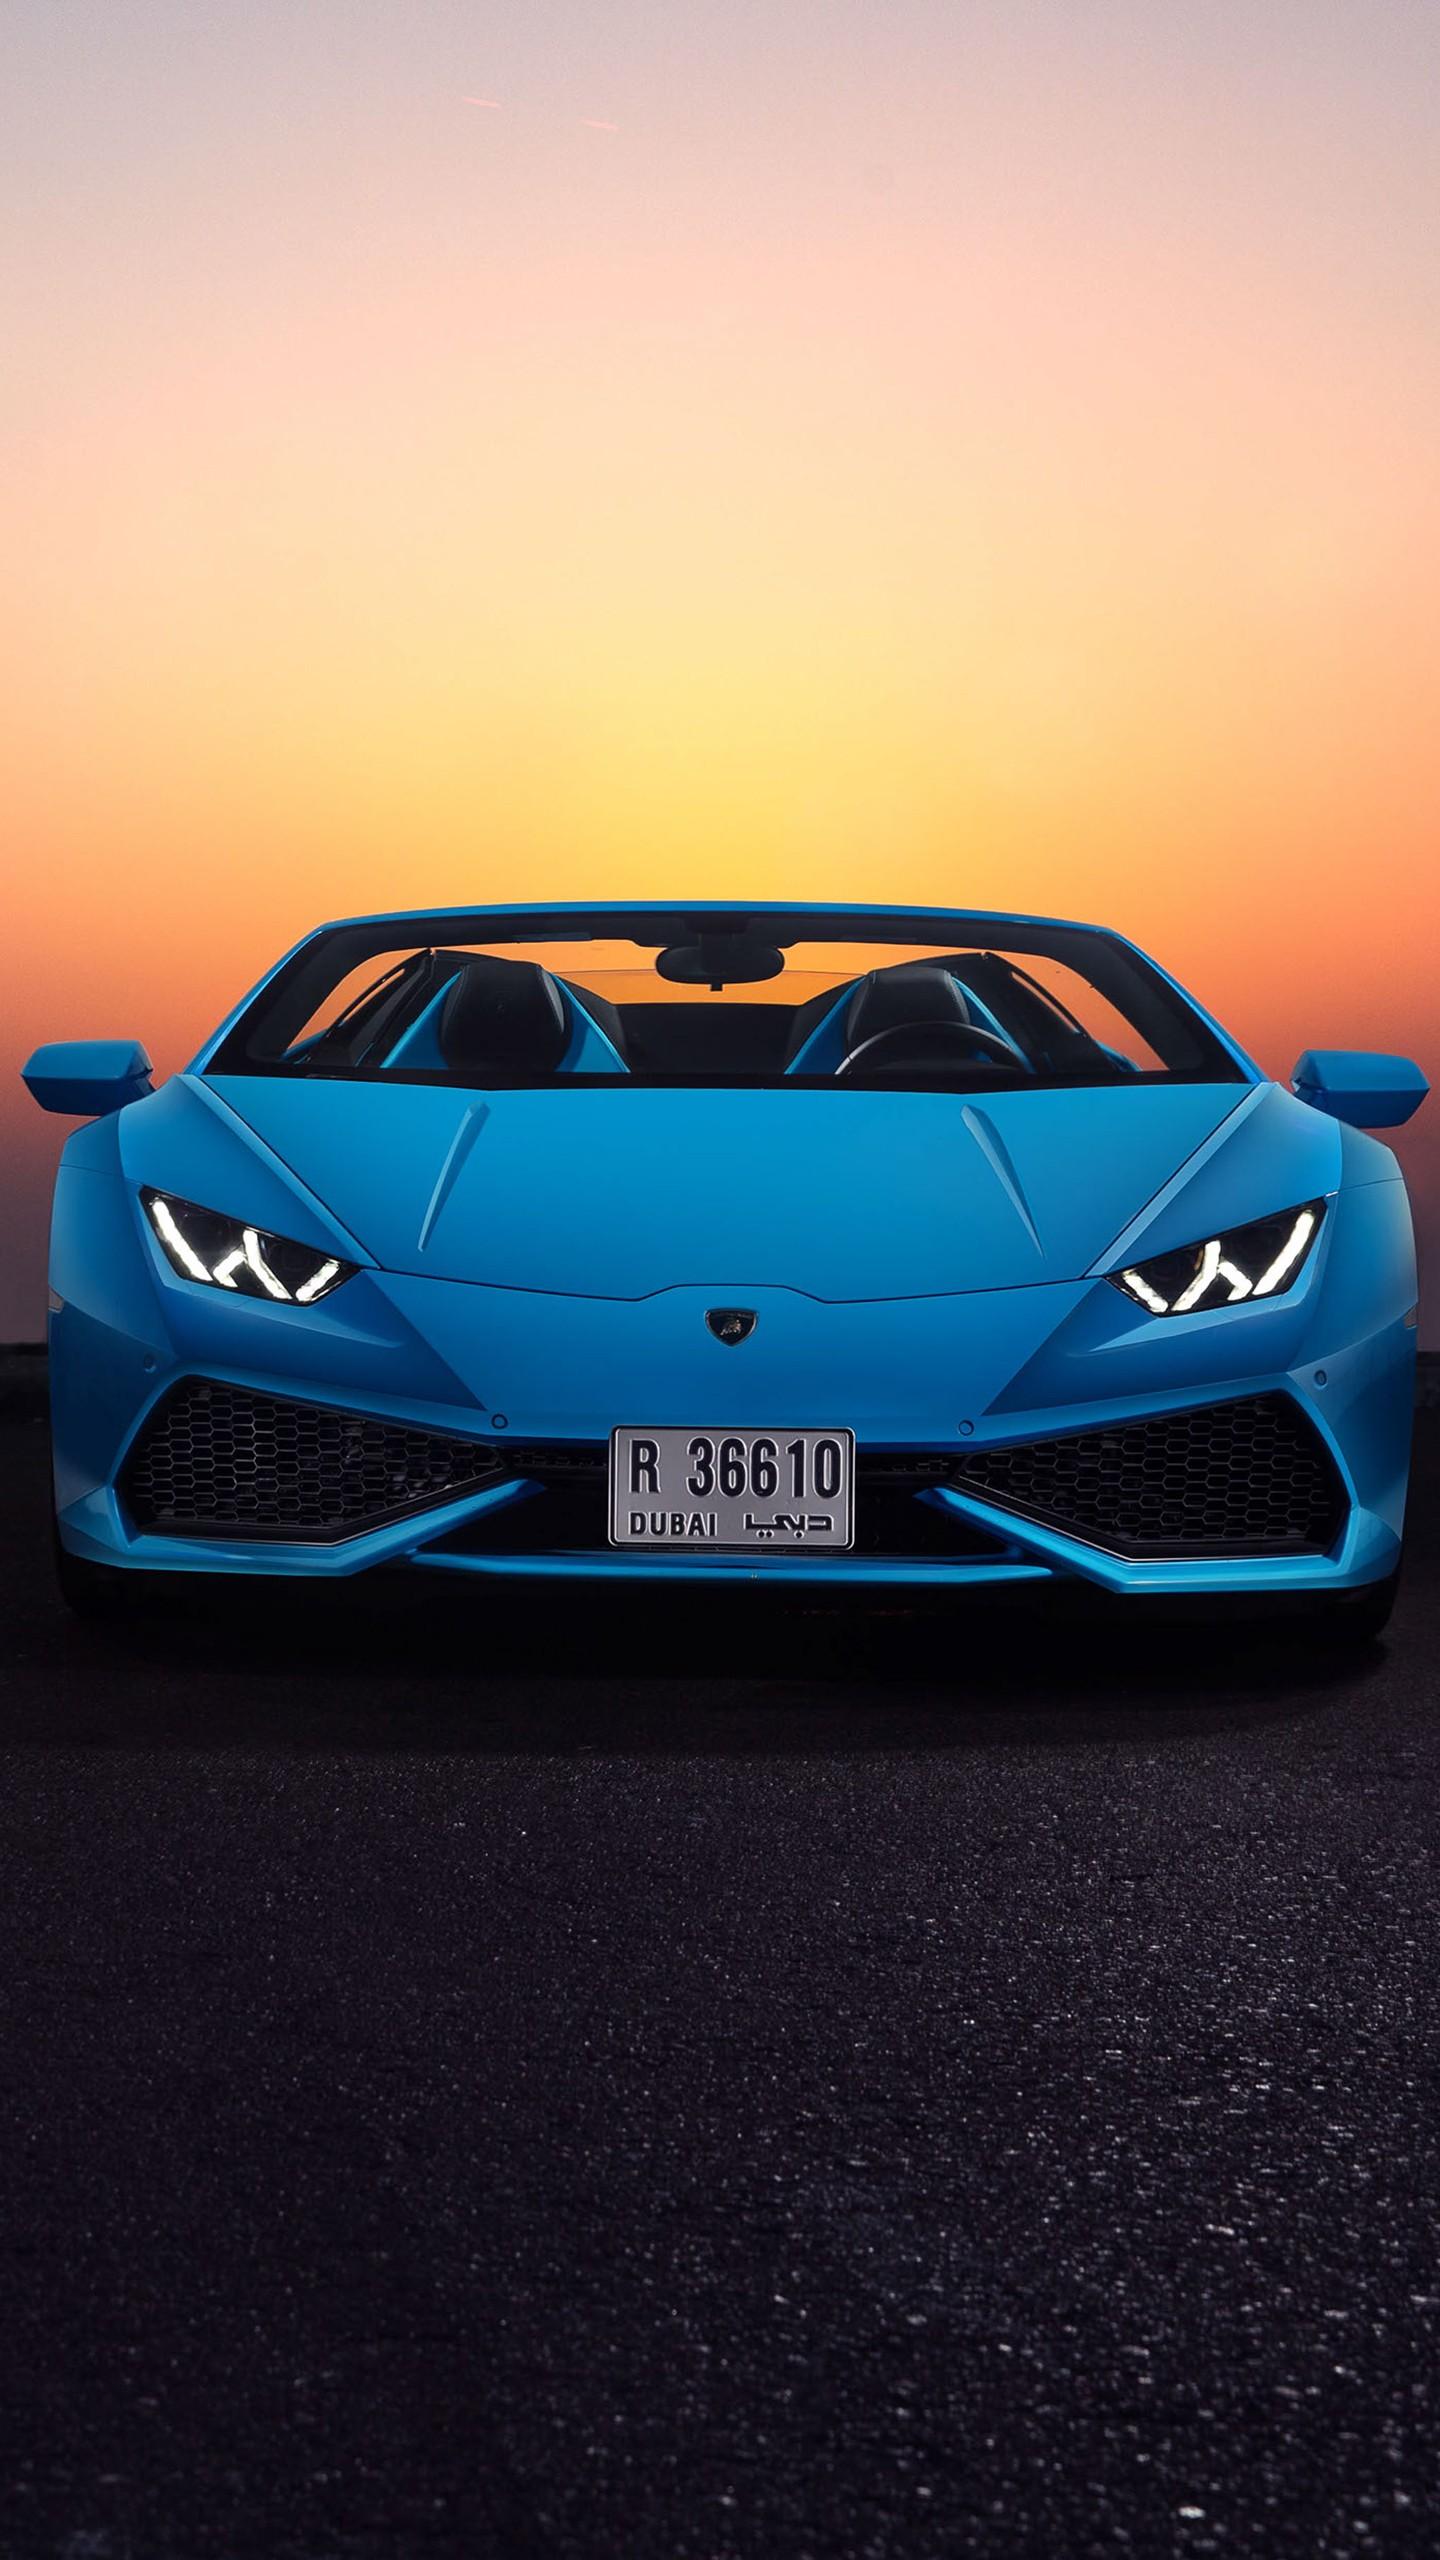 Iphone 5s Wallpaper 3d Lamborghini Huracan Spyder Lp 610 4 4k Wallpapers Hd